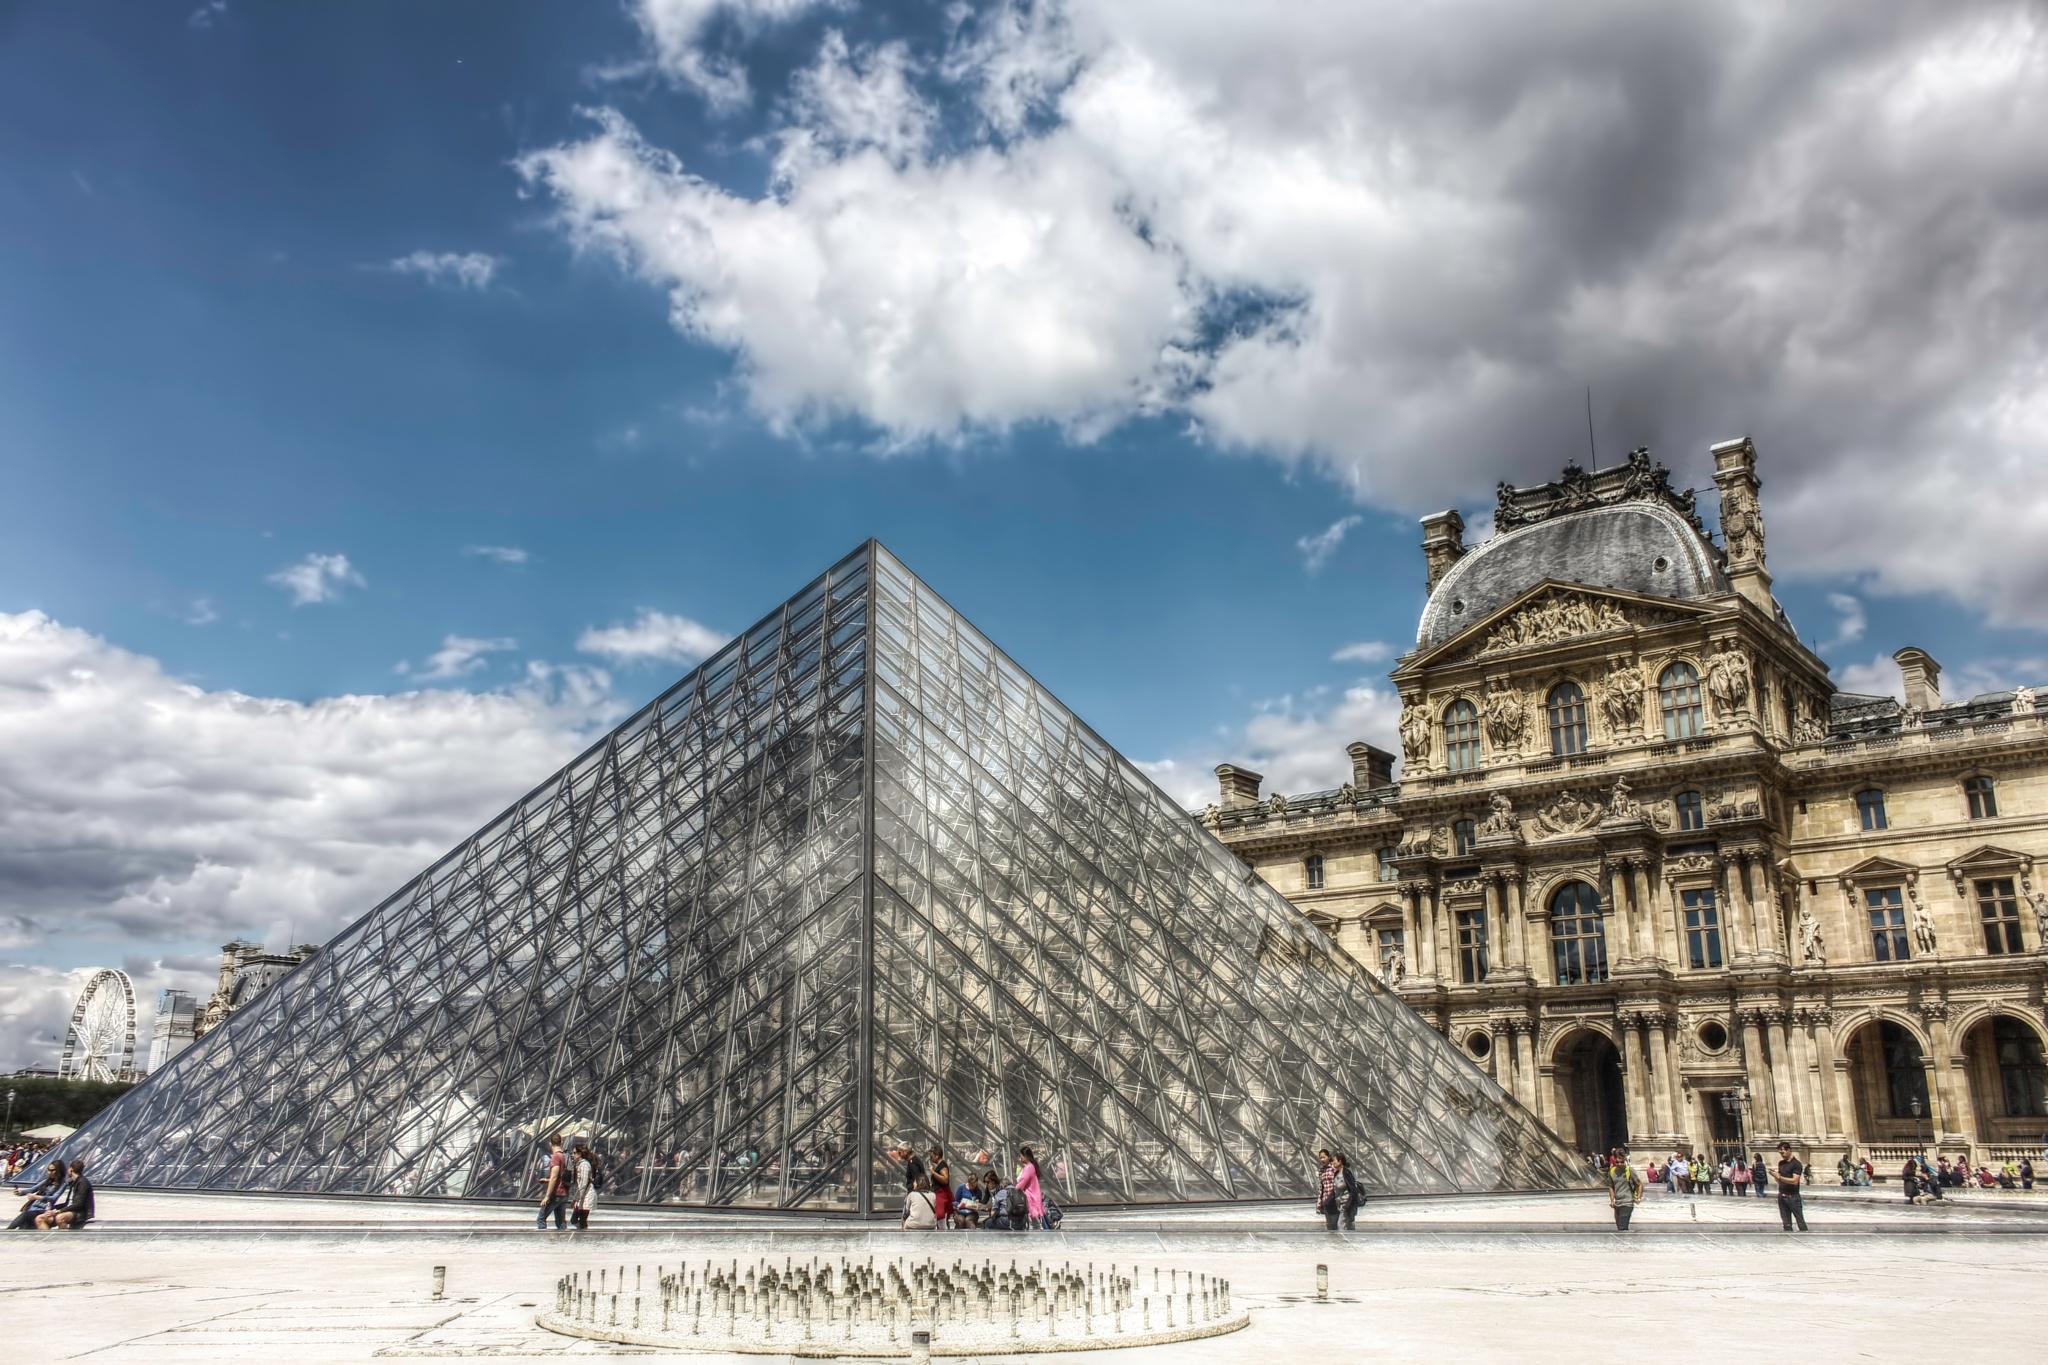 The Louvre by Kashif Yusufzai